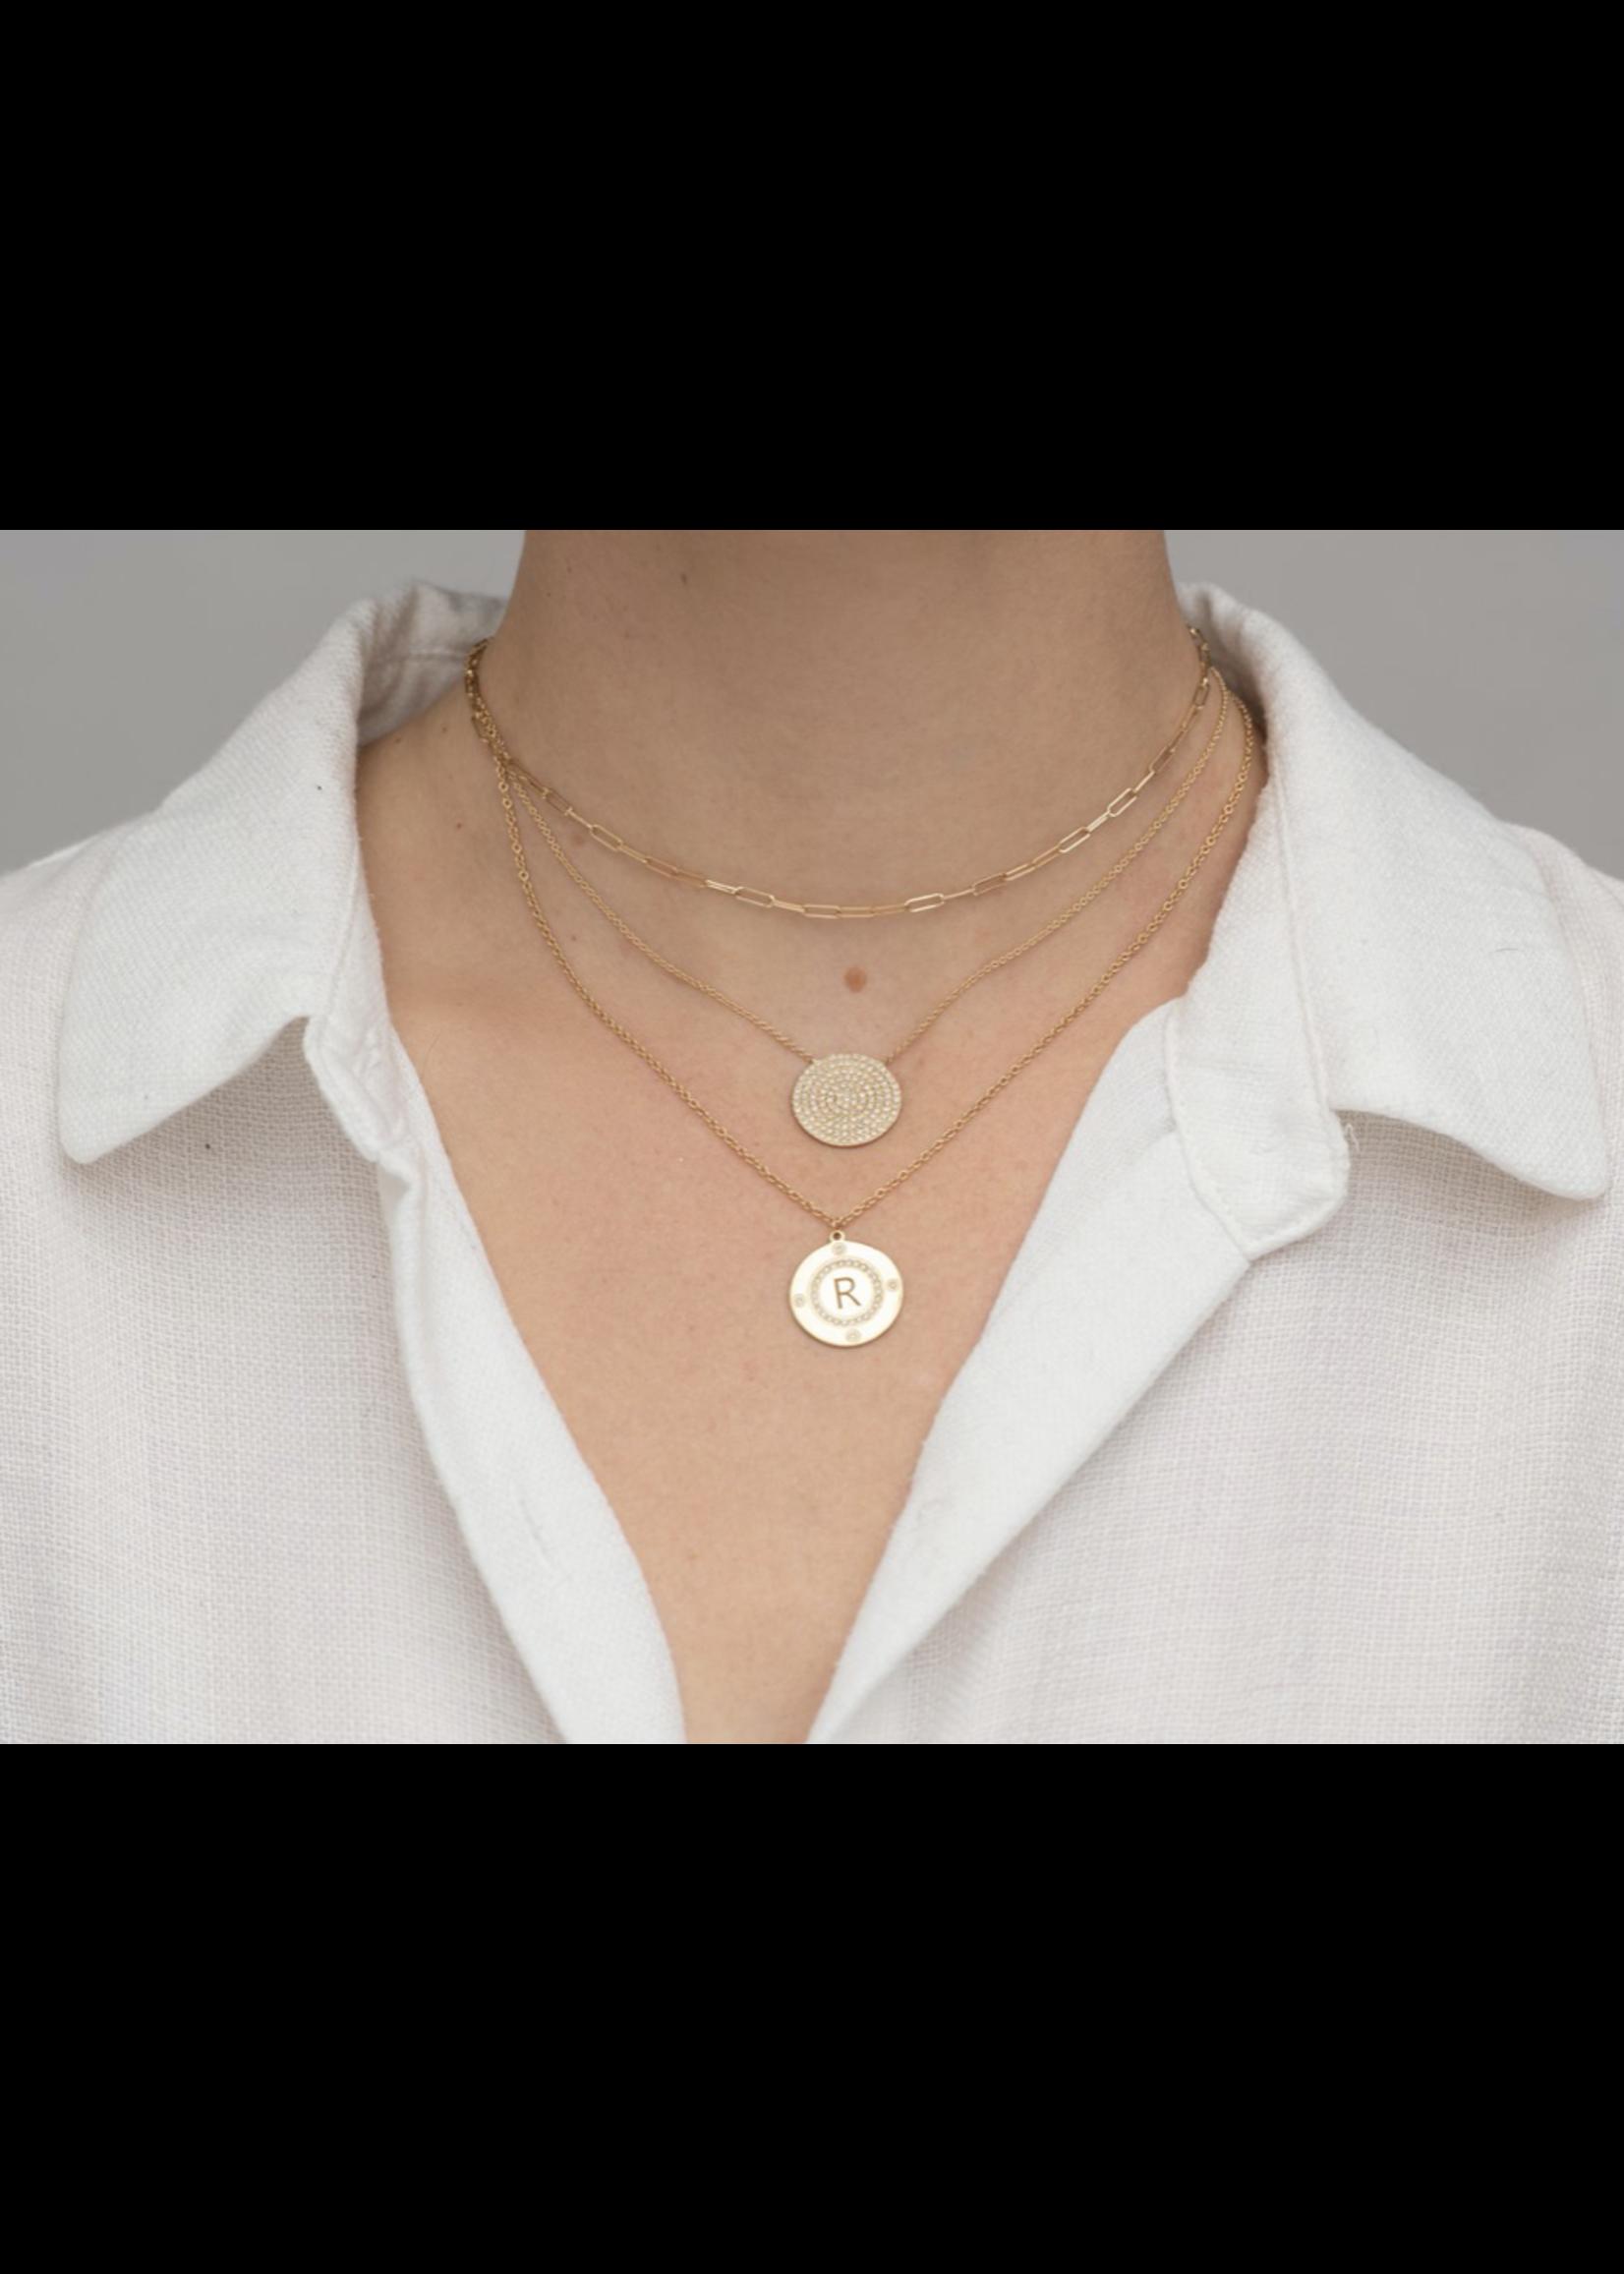 Rachel Reid Personalized Diamond Disc Necklace